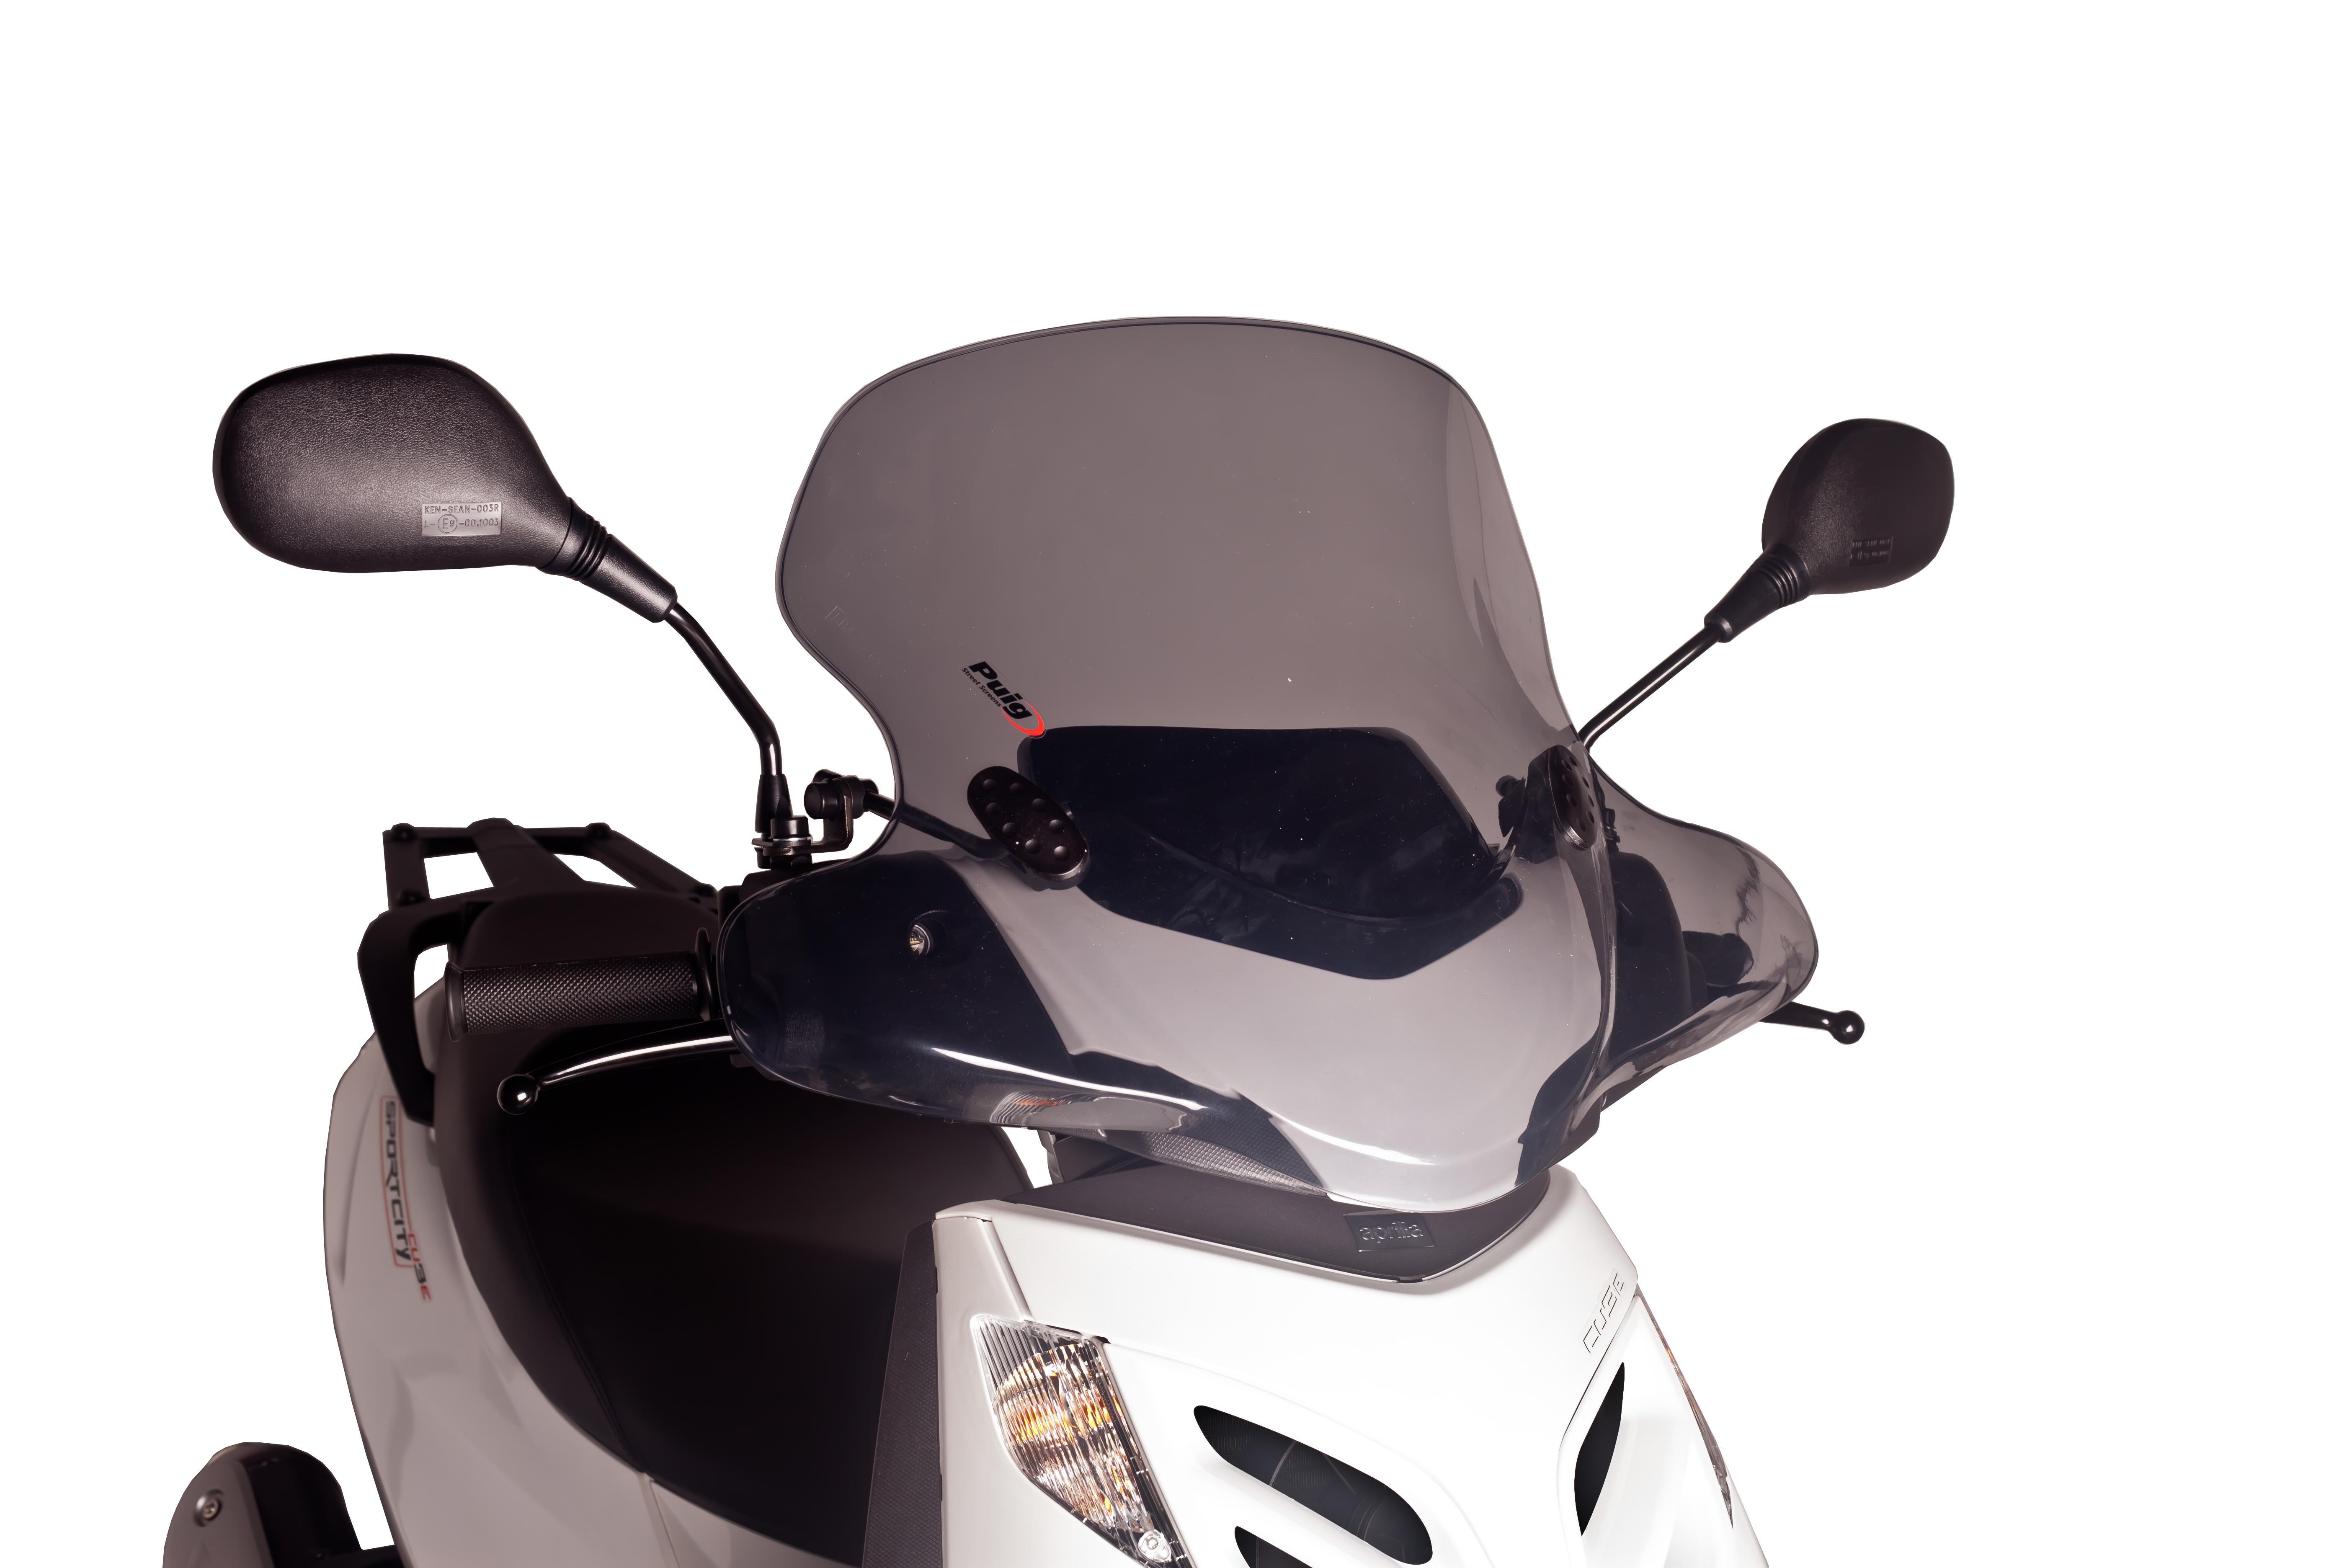 Cúpula Puig City Touring ahumado 6025 para moto APRILIA SPORTCITY CUBE 125/300 08-13